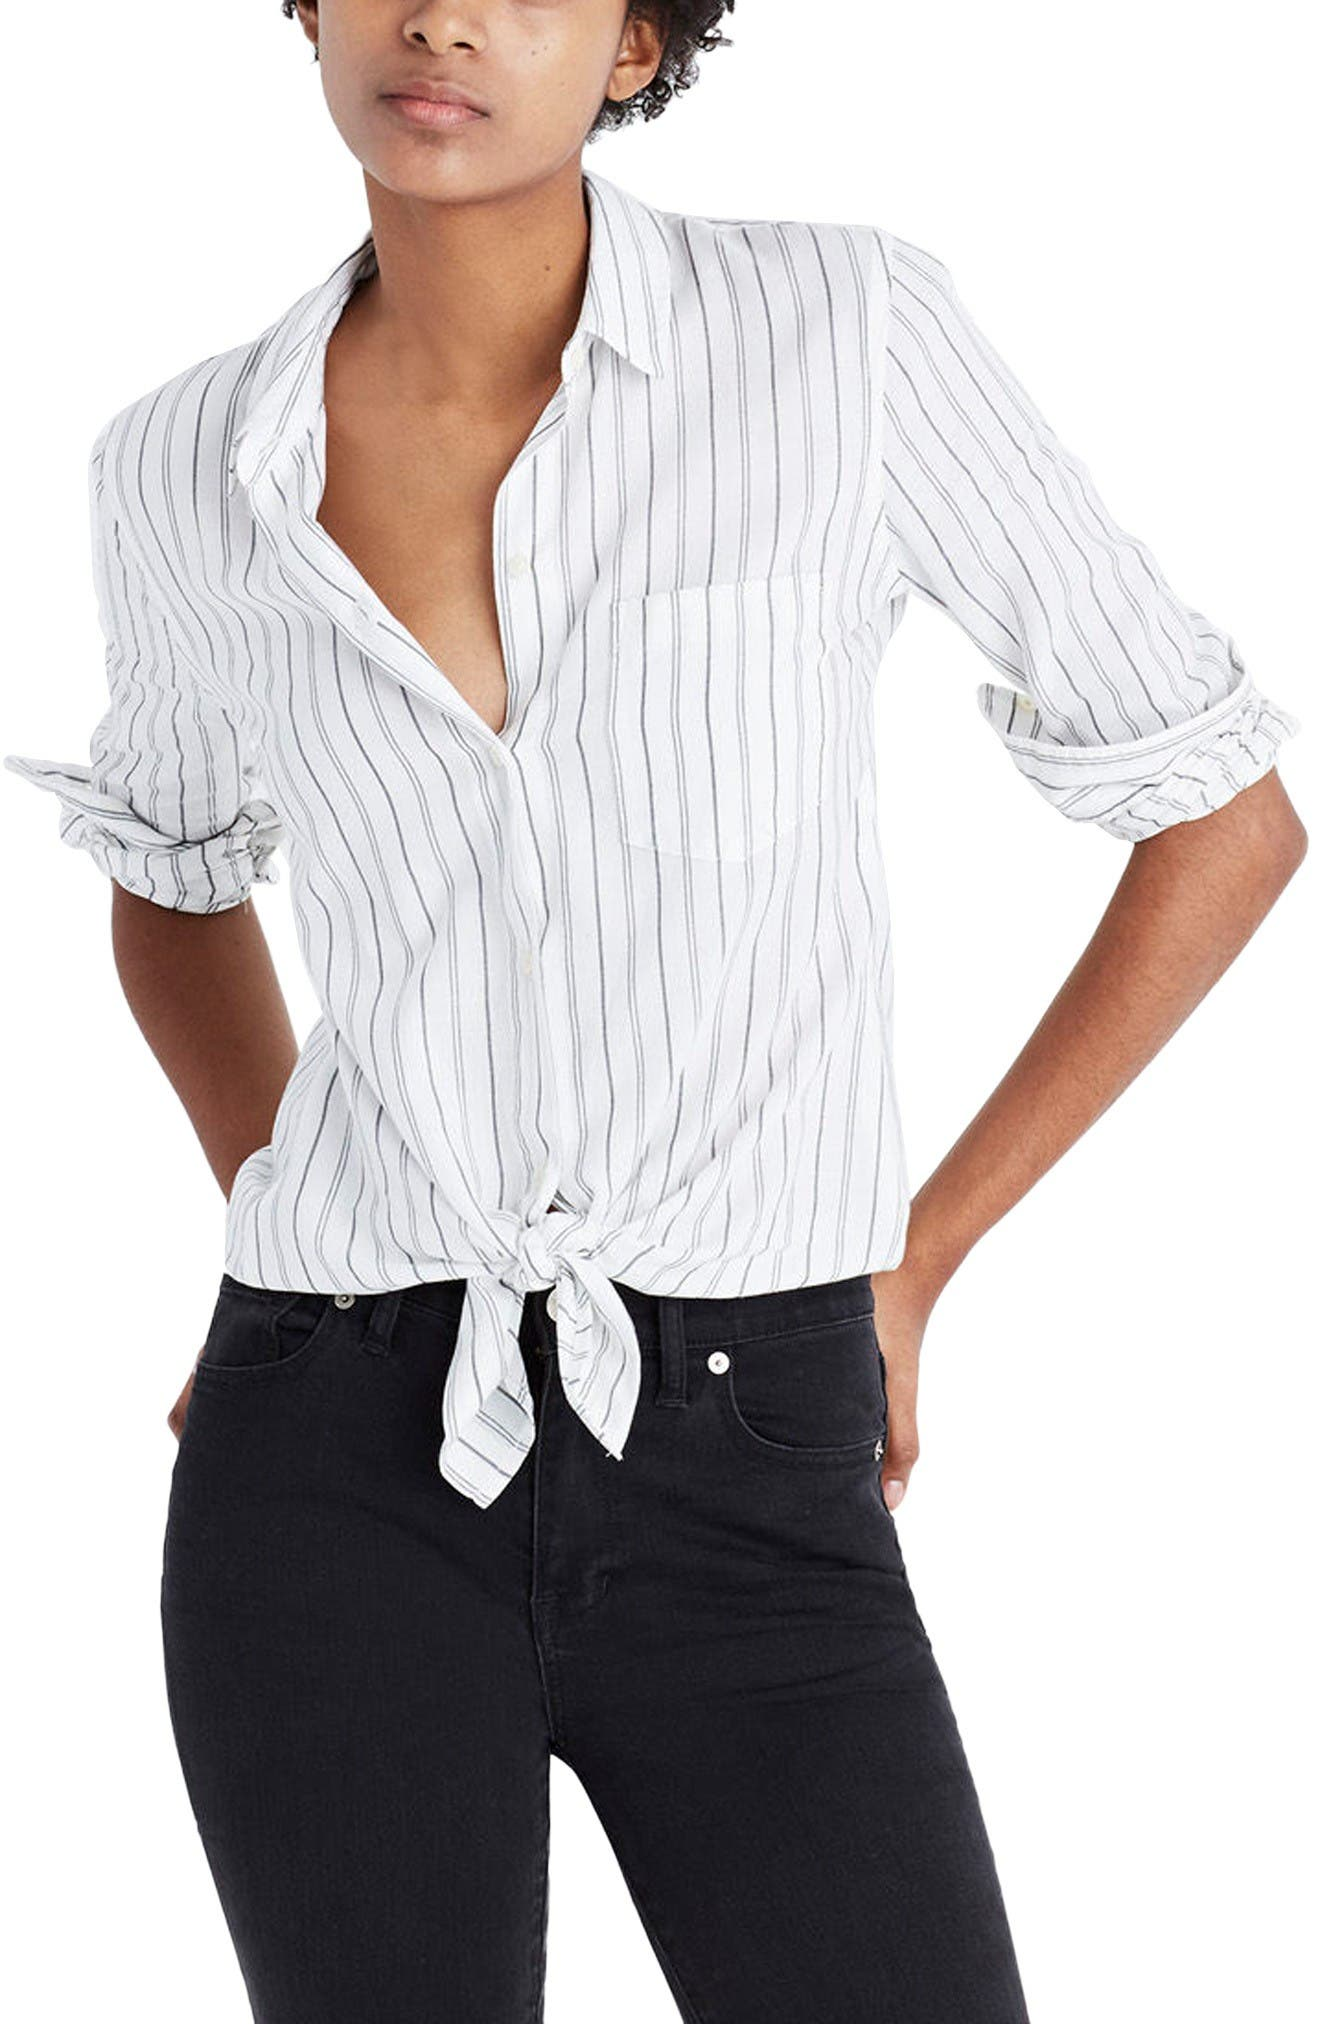 black shirt and white tie